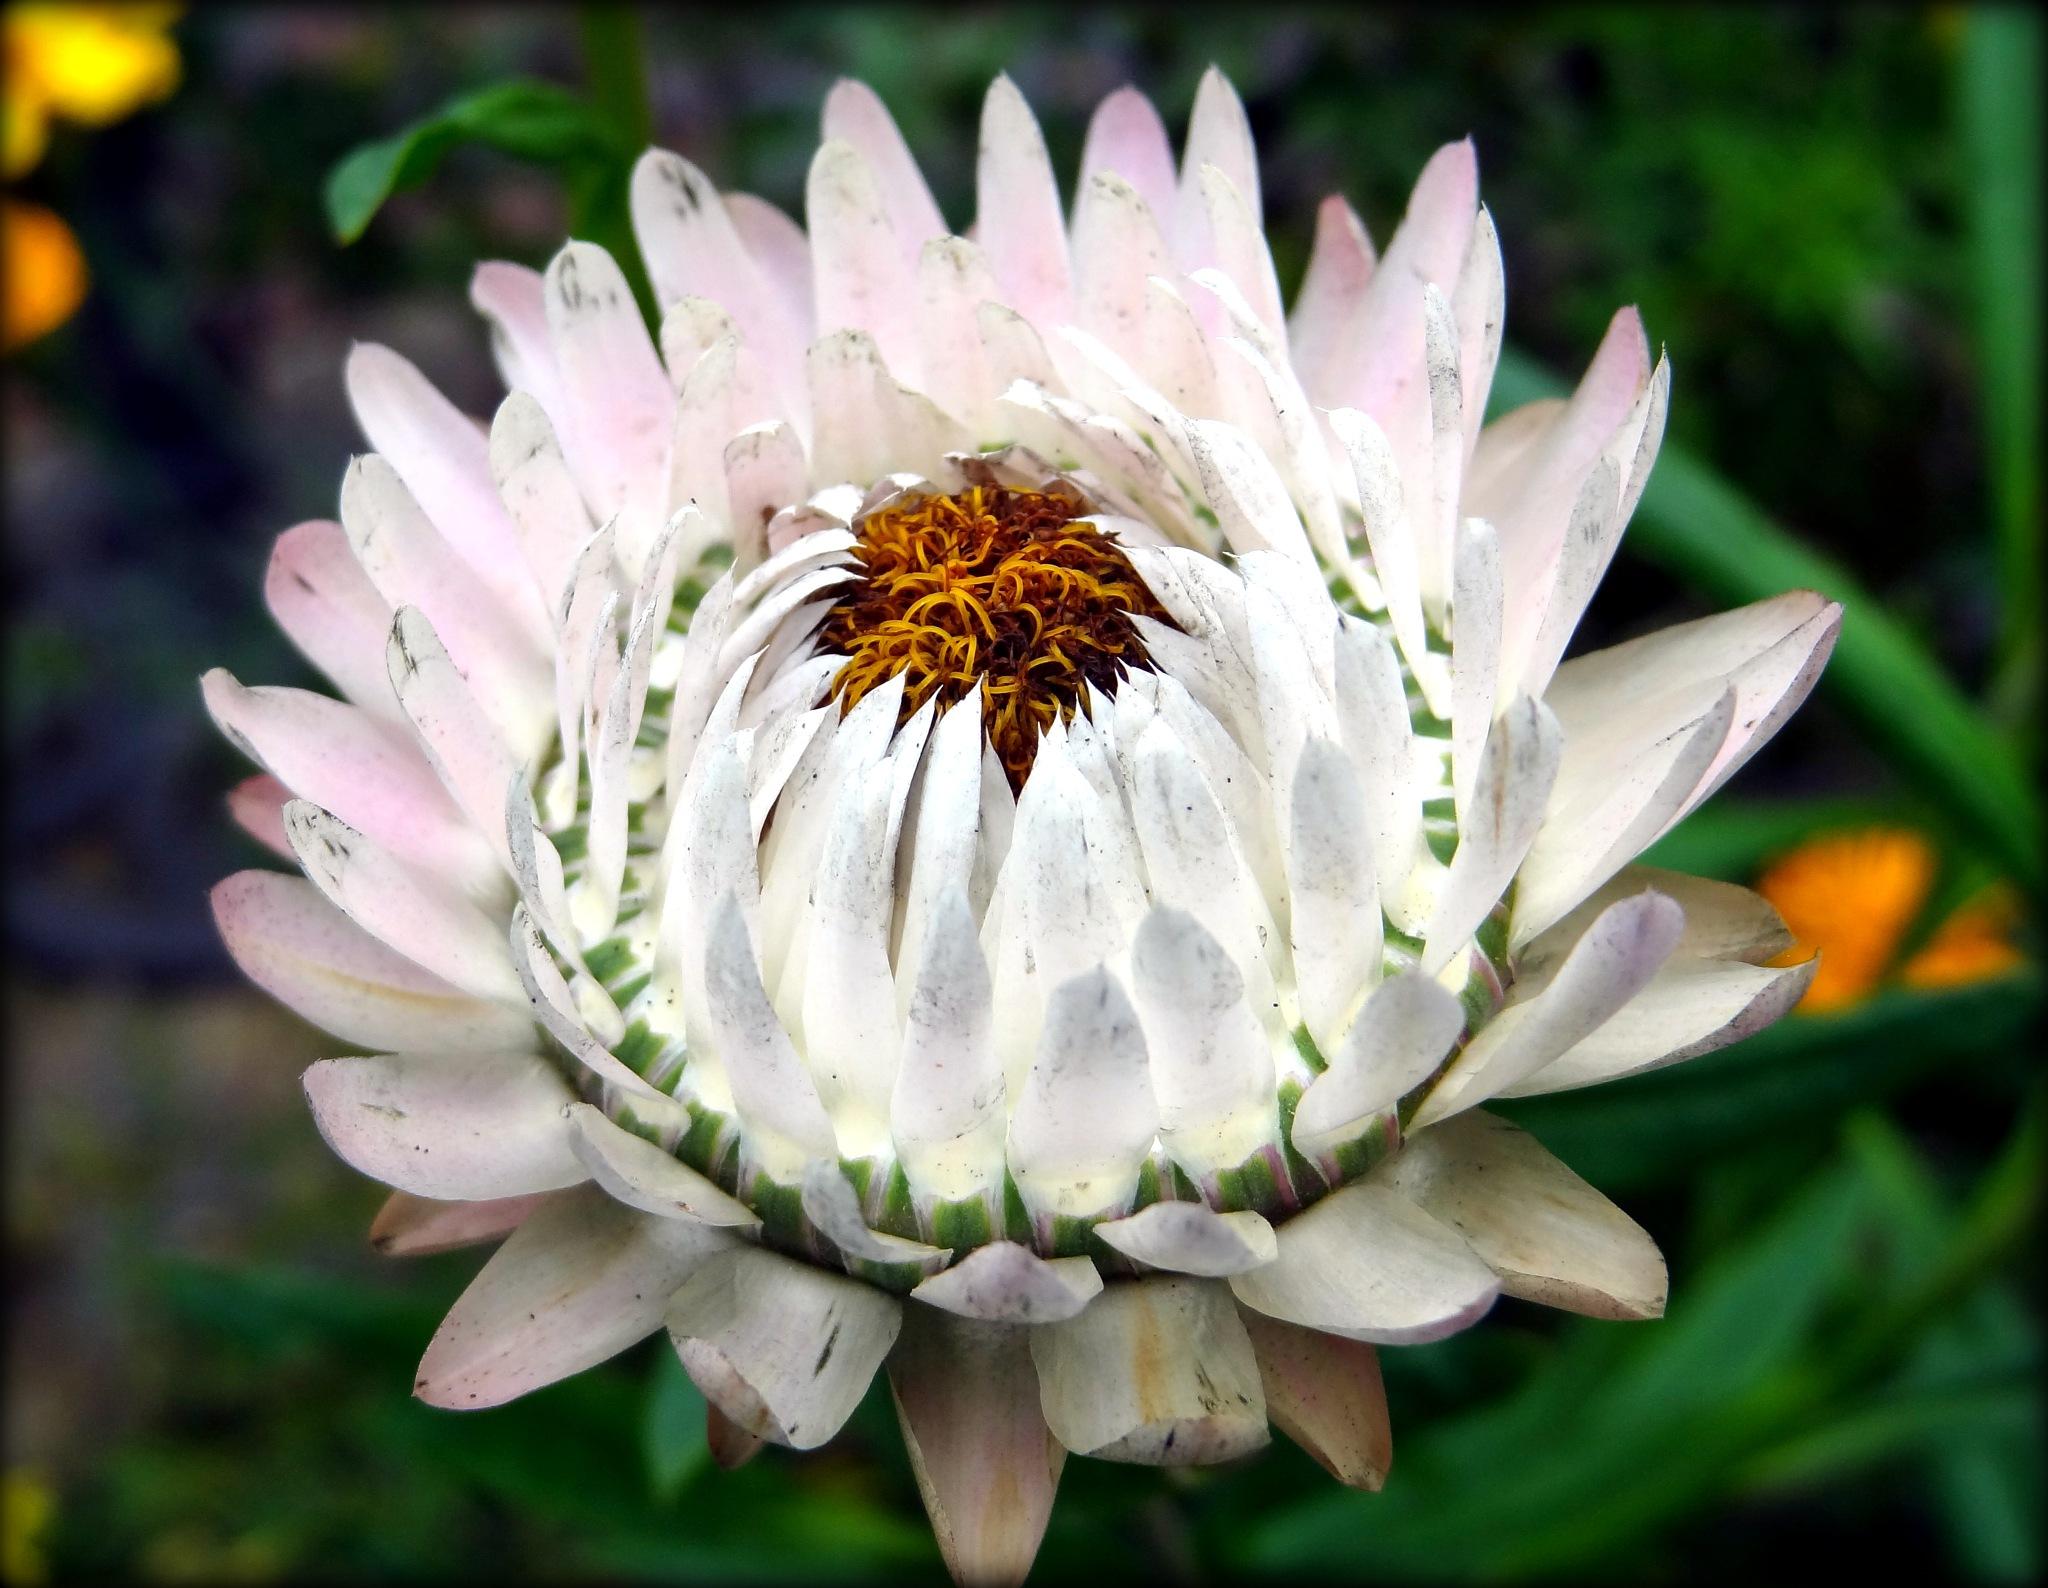 Strawflower by jcmunckton